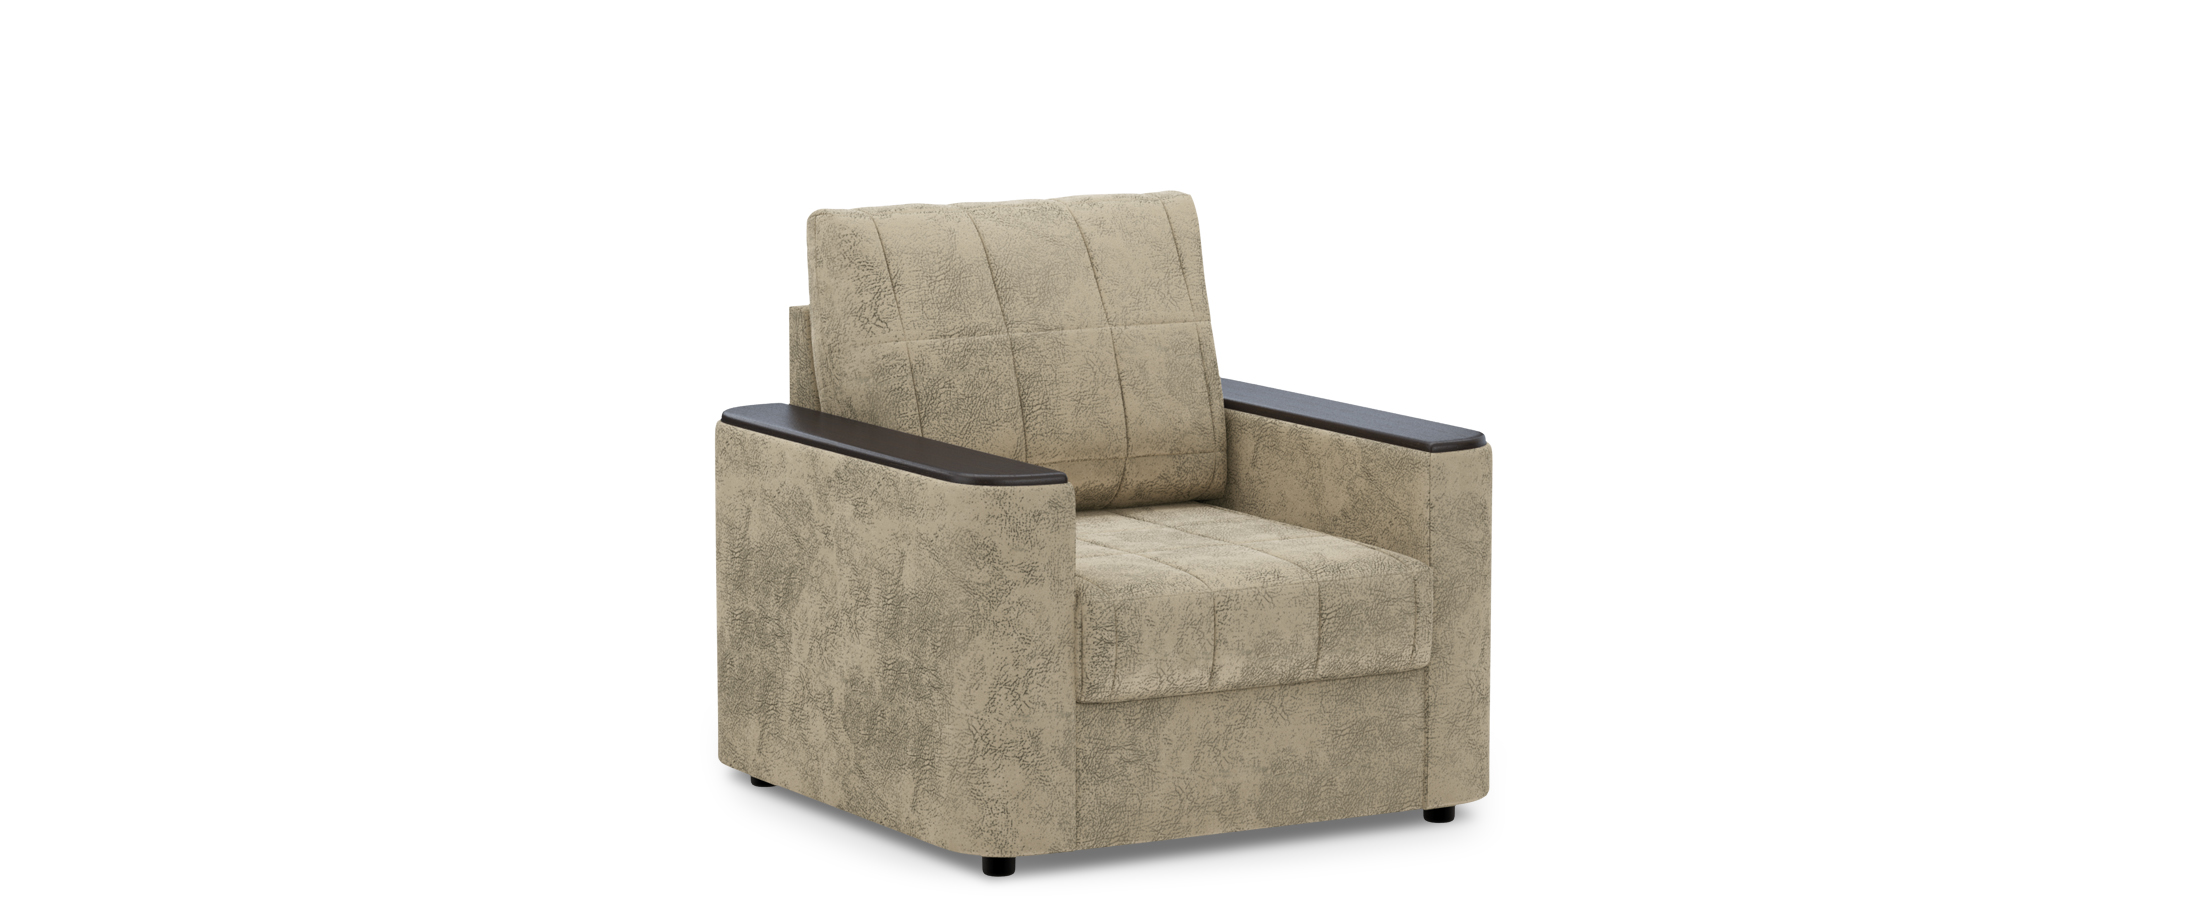 Кресло тканевое Даллас 018 фото